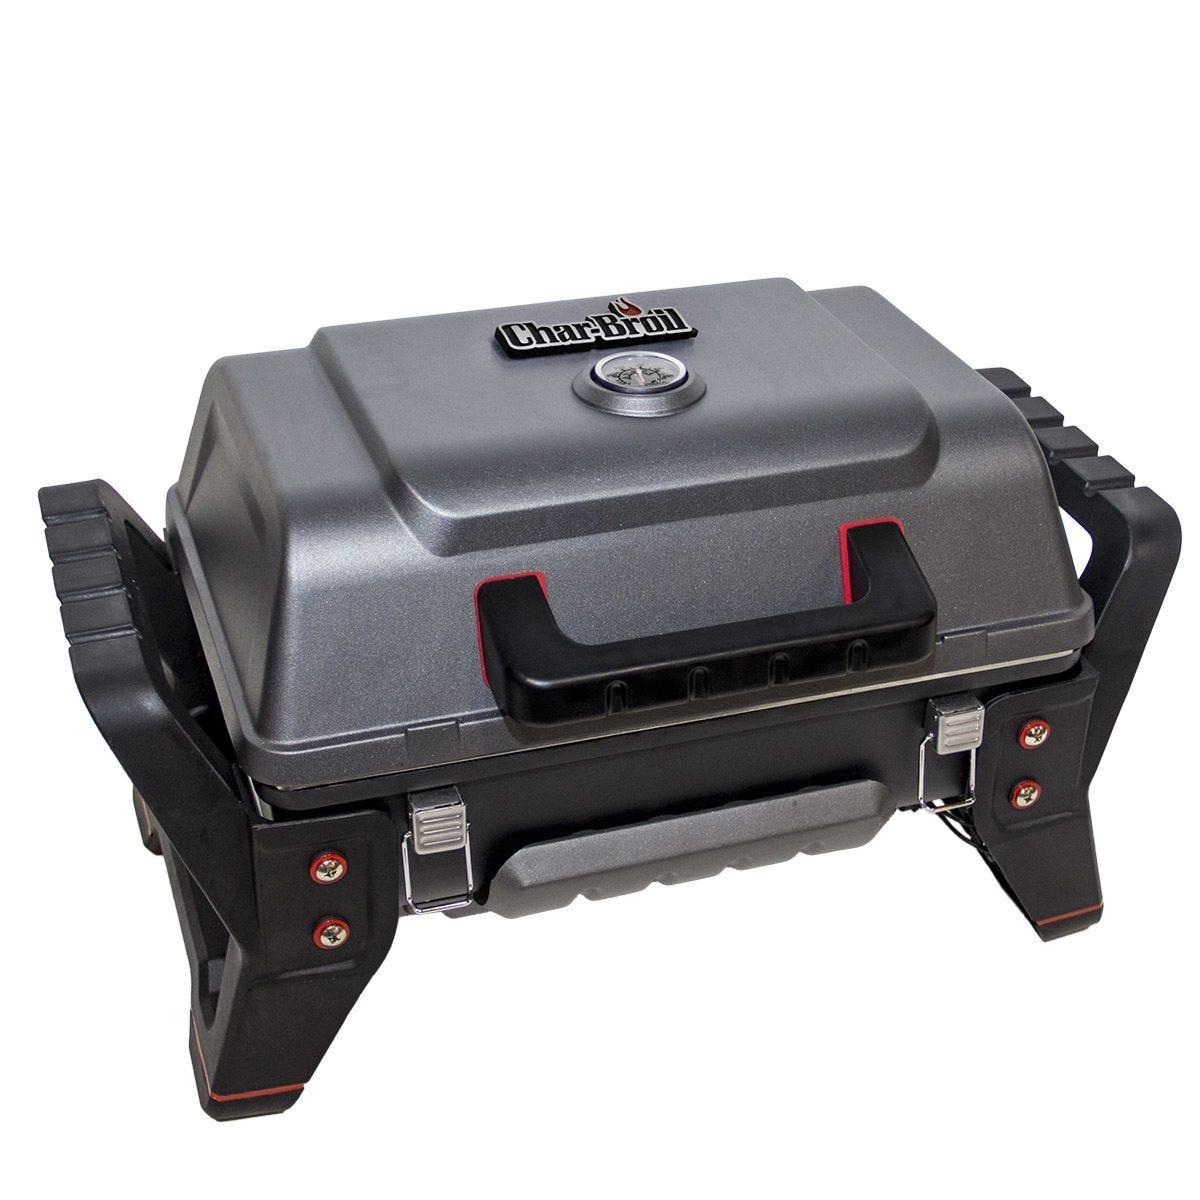 Char-Broil Grill2Go X200 Portable Gas BBQ - Grey